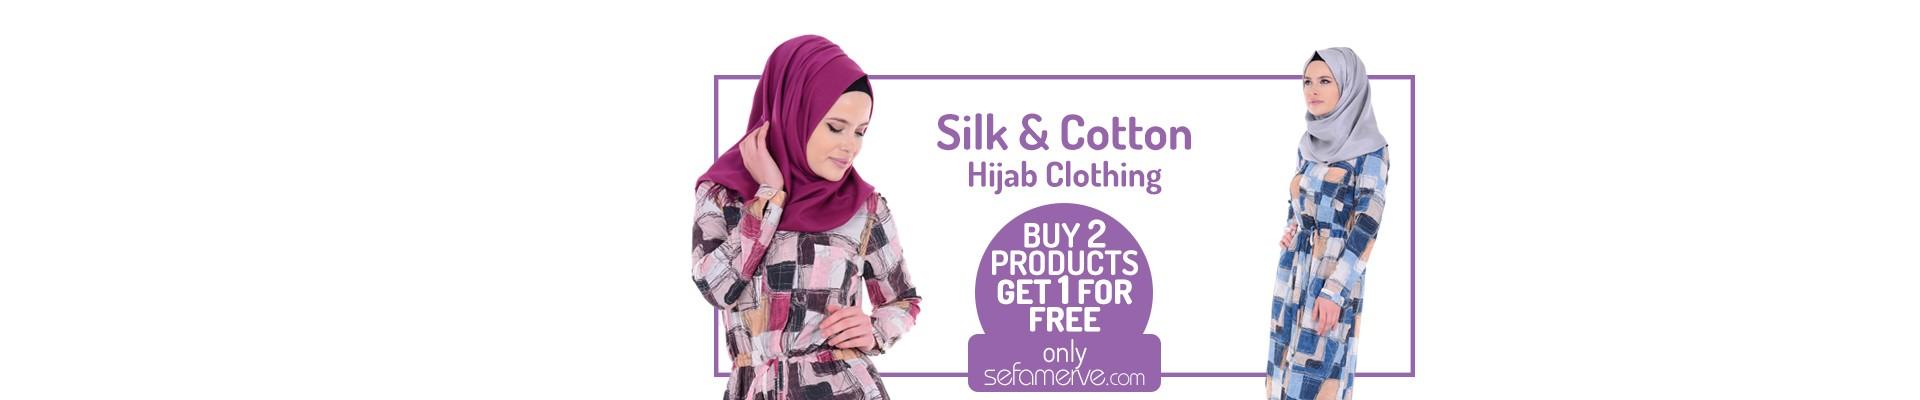 Silk&Cotton buy 2 get 1 free